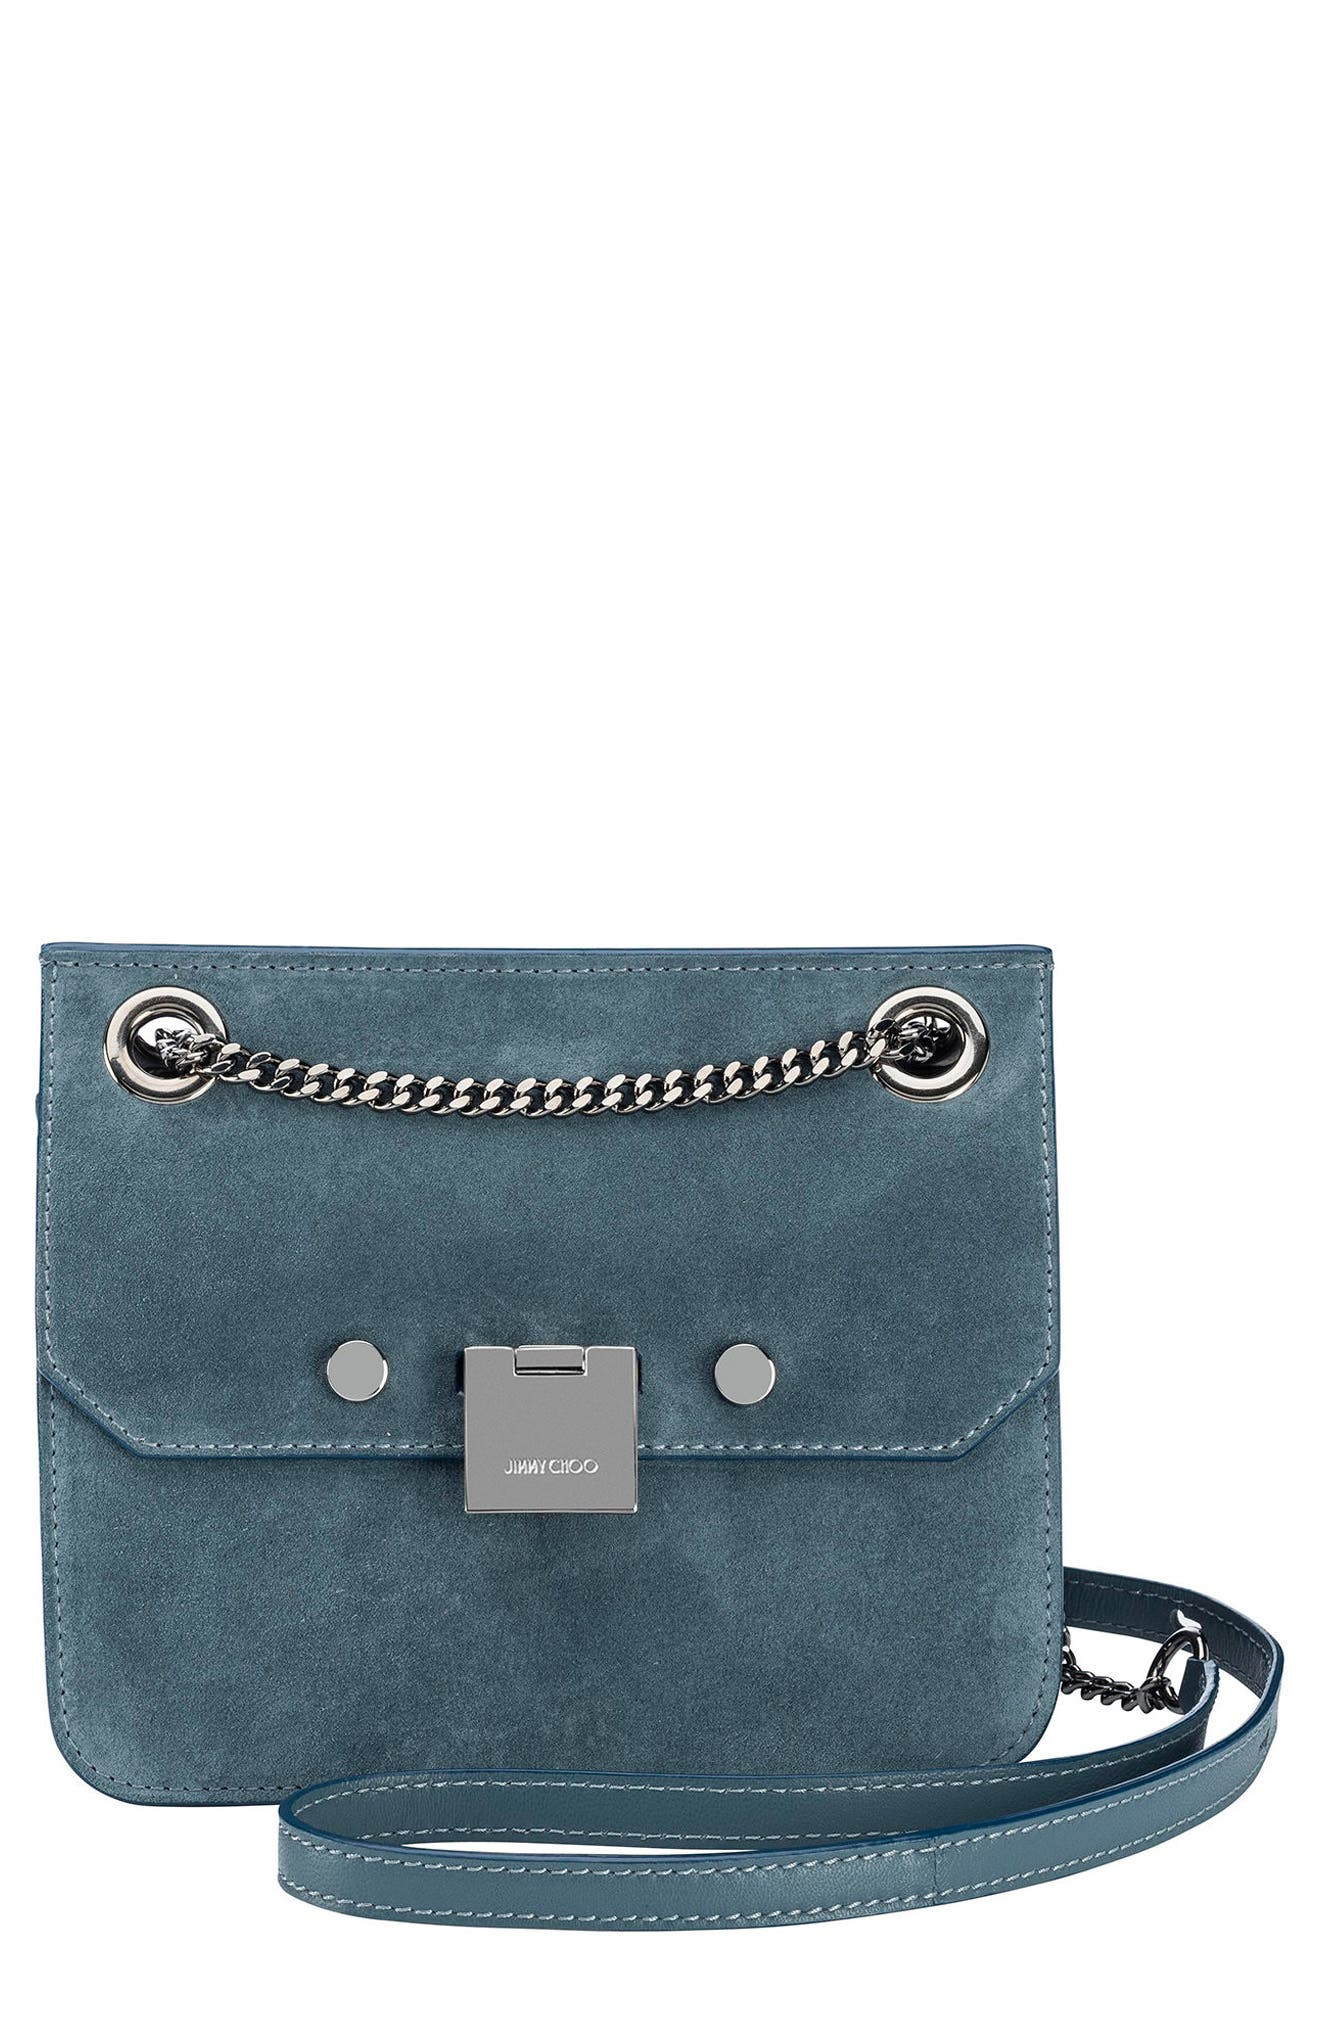 Rebel Suede Crossbody Bag,                             Main thumbnail 1, color,                             Dusk Blue